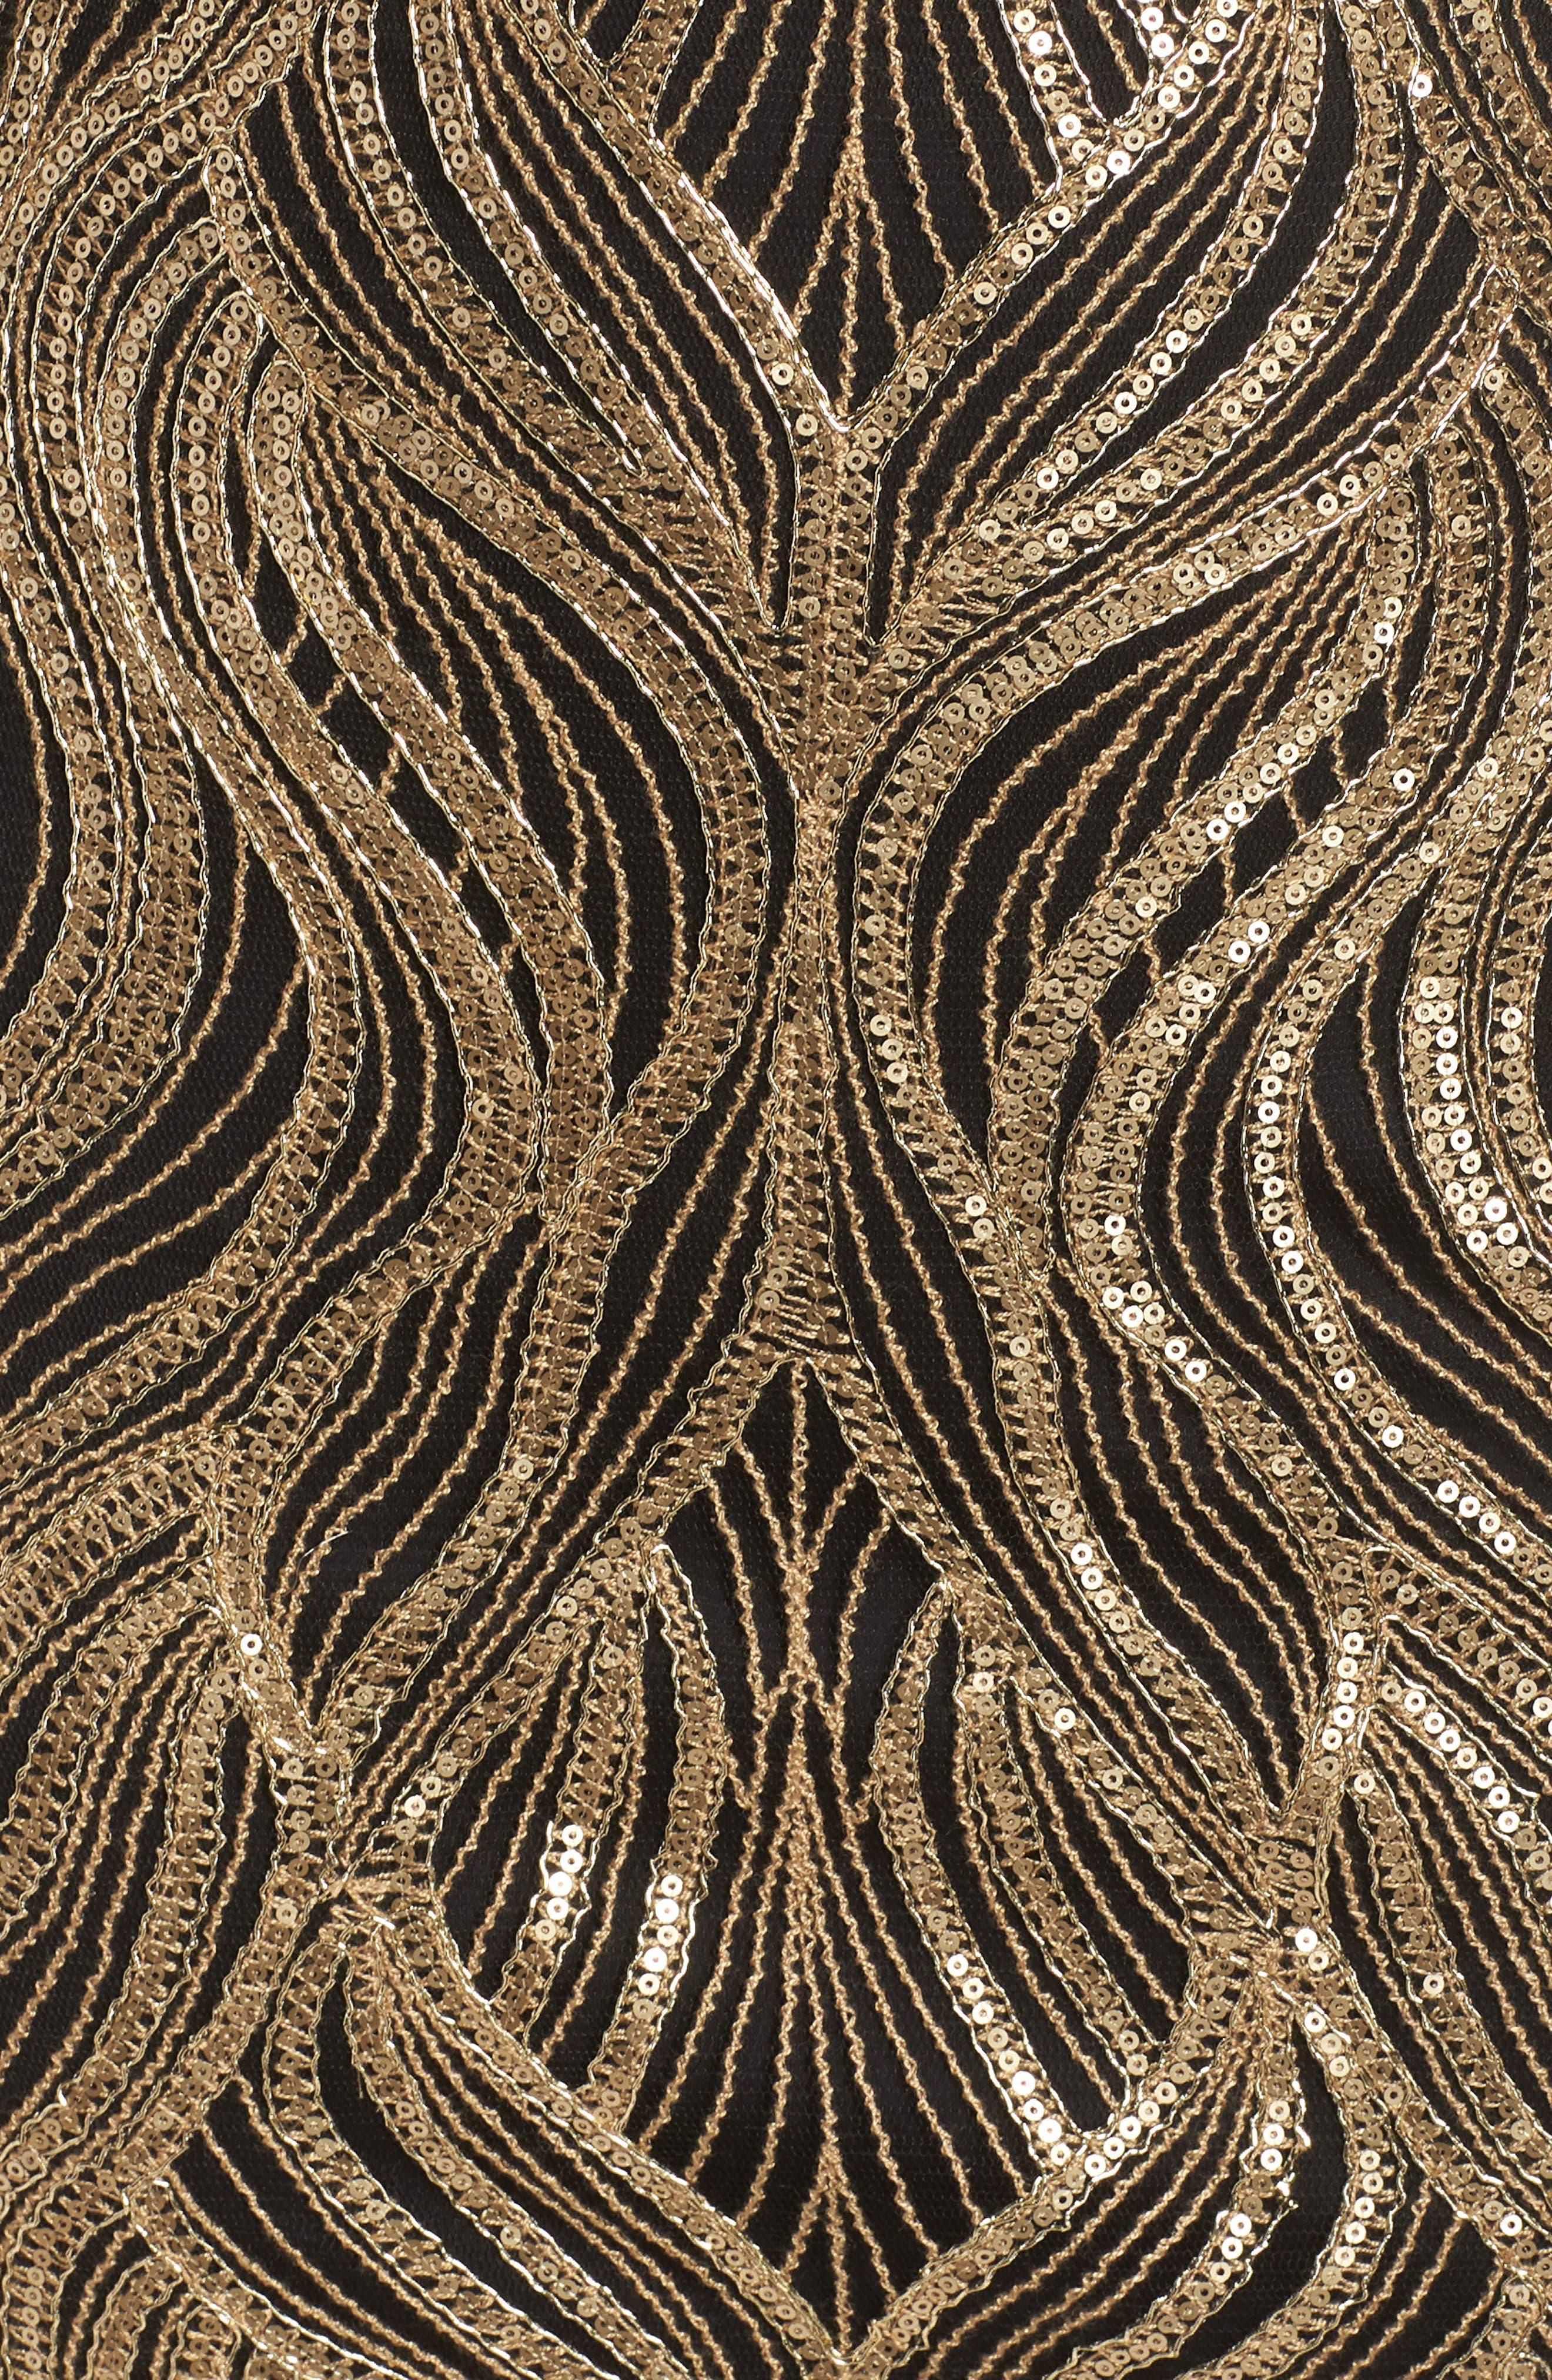 Long Sleeve Sequin Mesh Cocktail Dress,                             Alternate thumbnail 6, color,                             GOLD/ BLACK